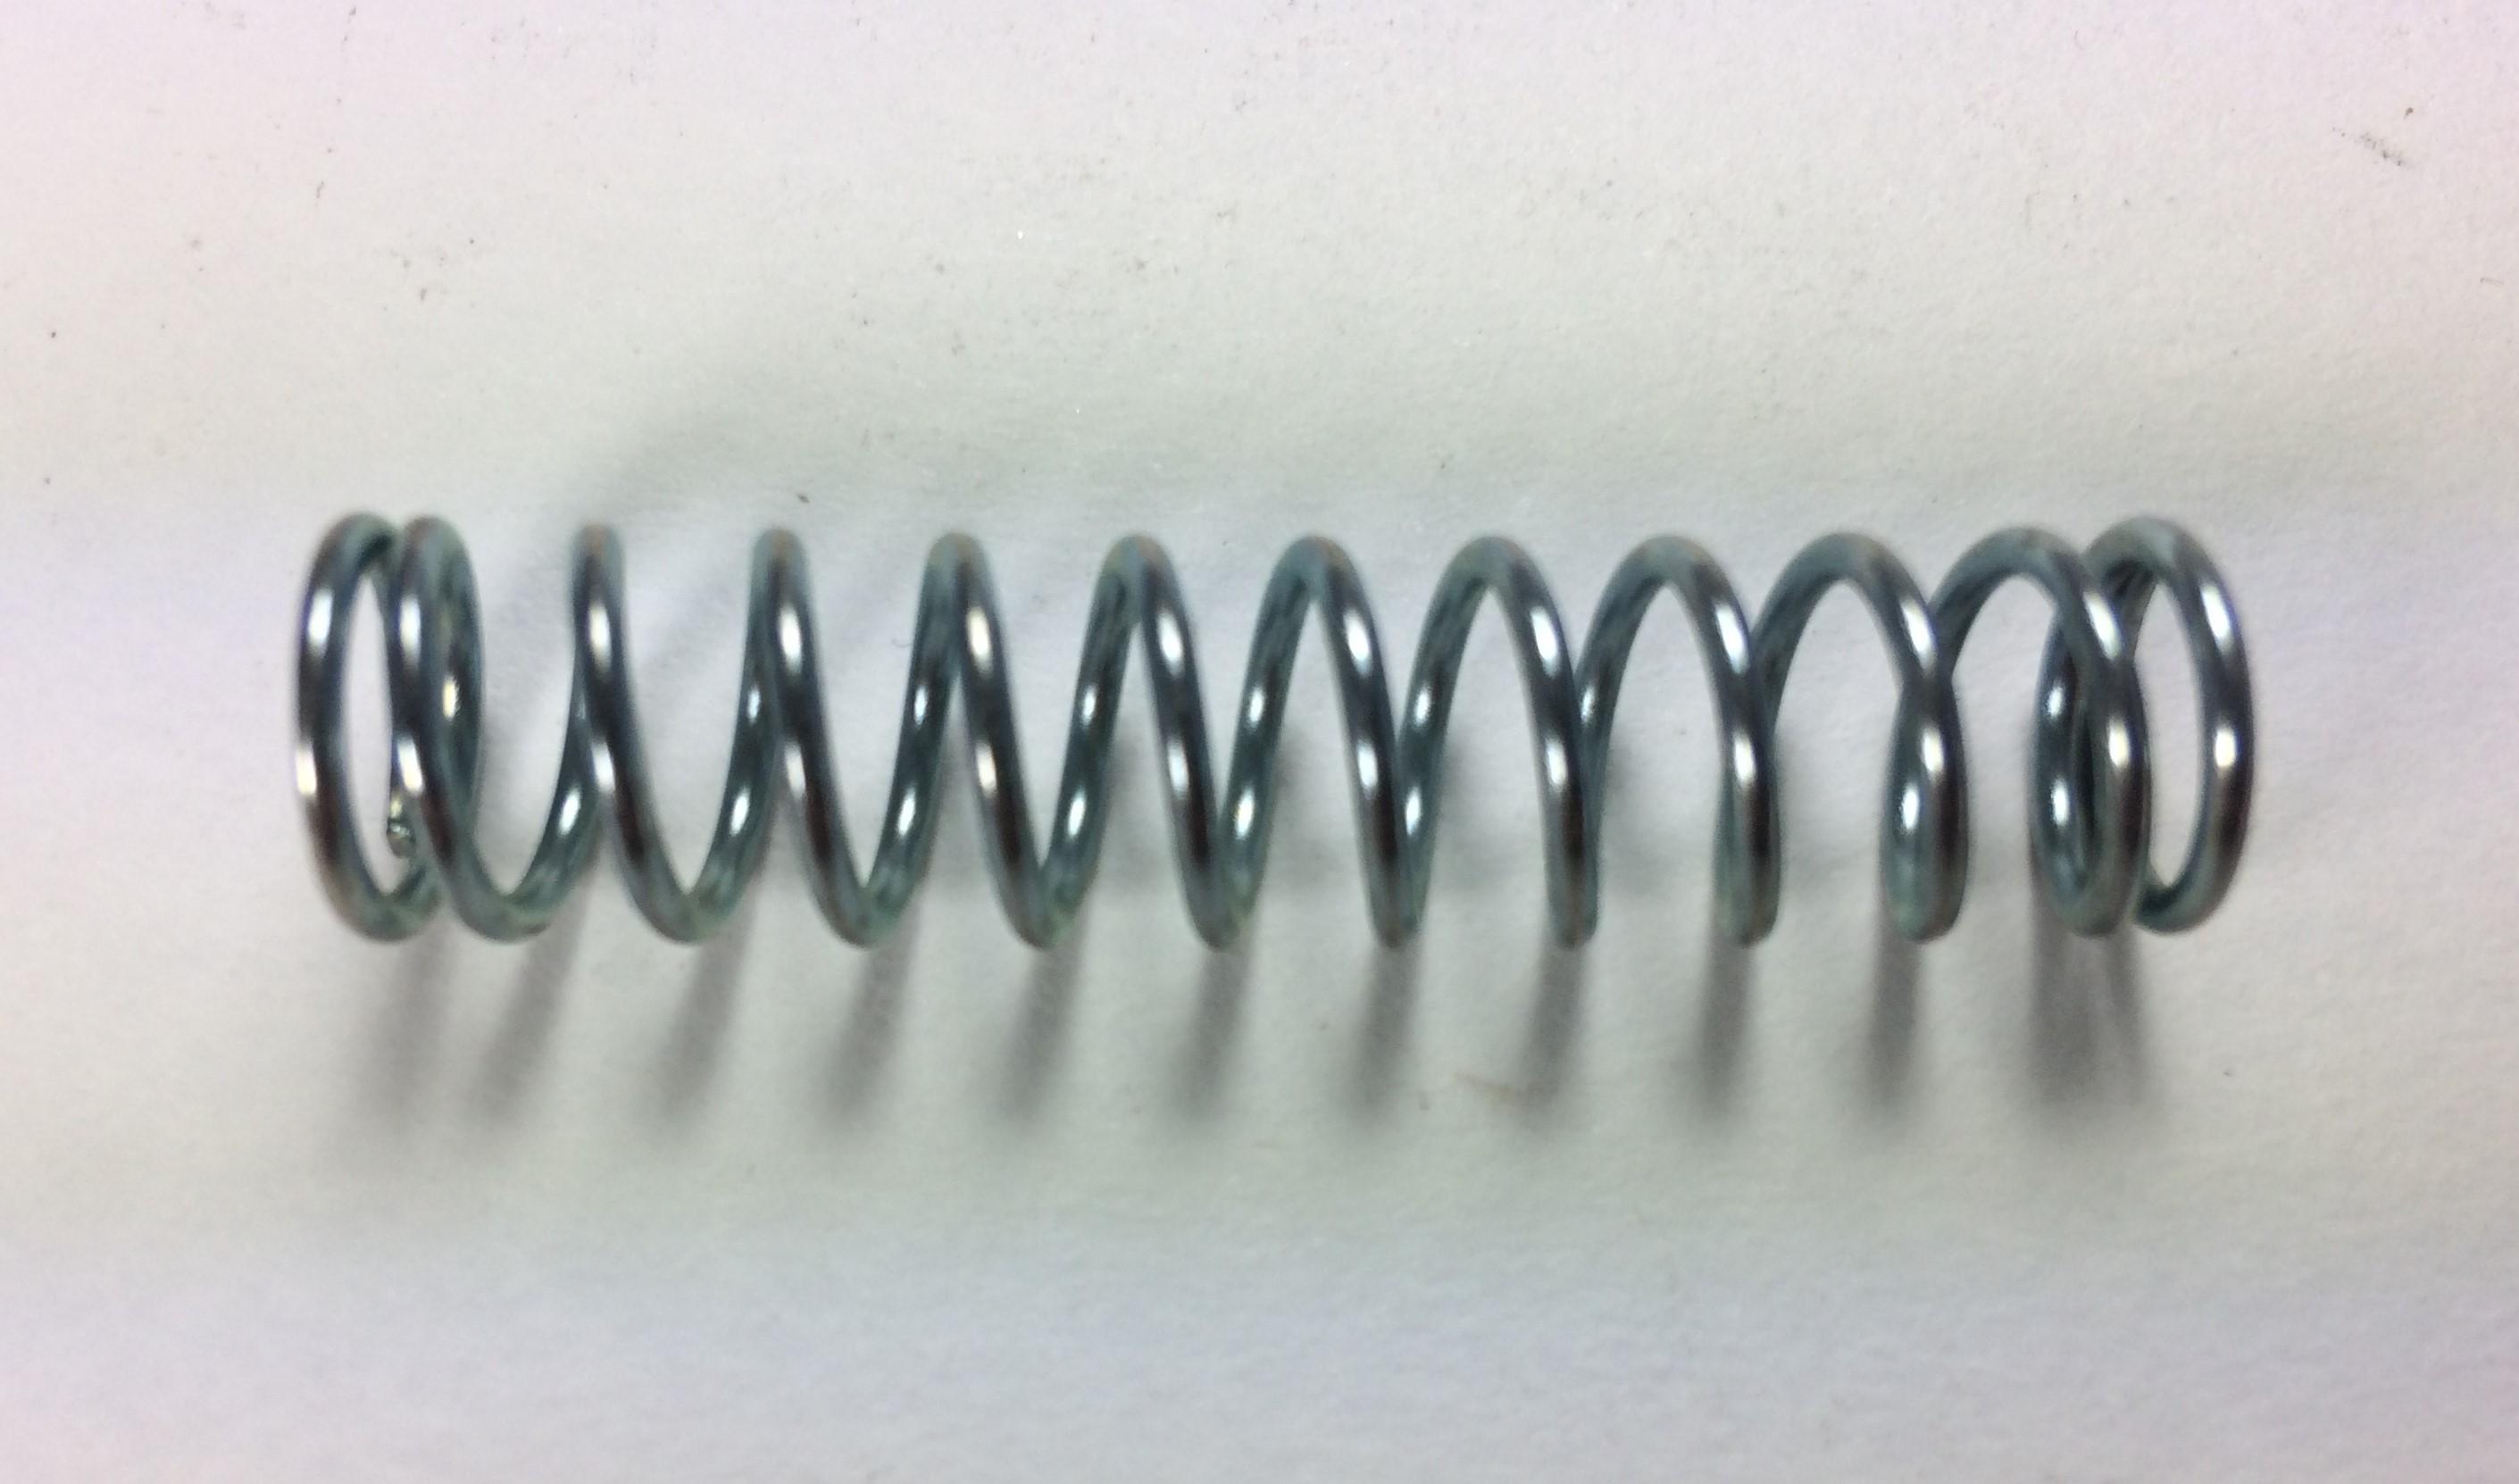 Home Name Plate Design Online Fac Slicer Motor Retaining Spring Fa 300 A 96